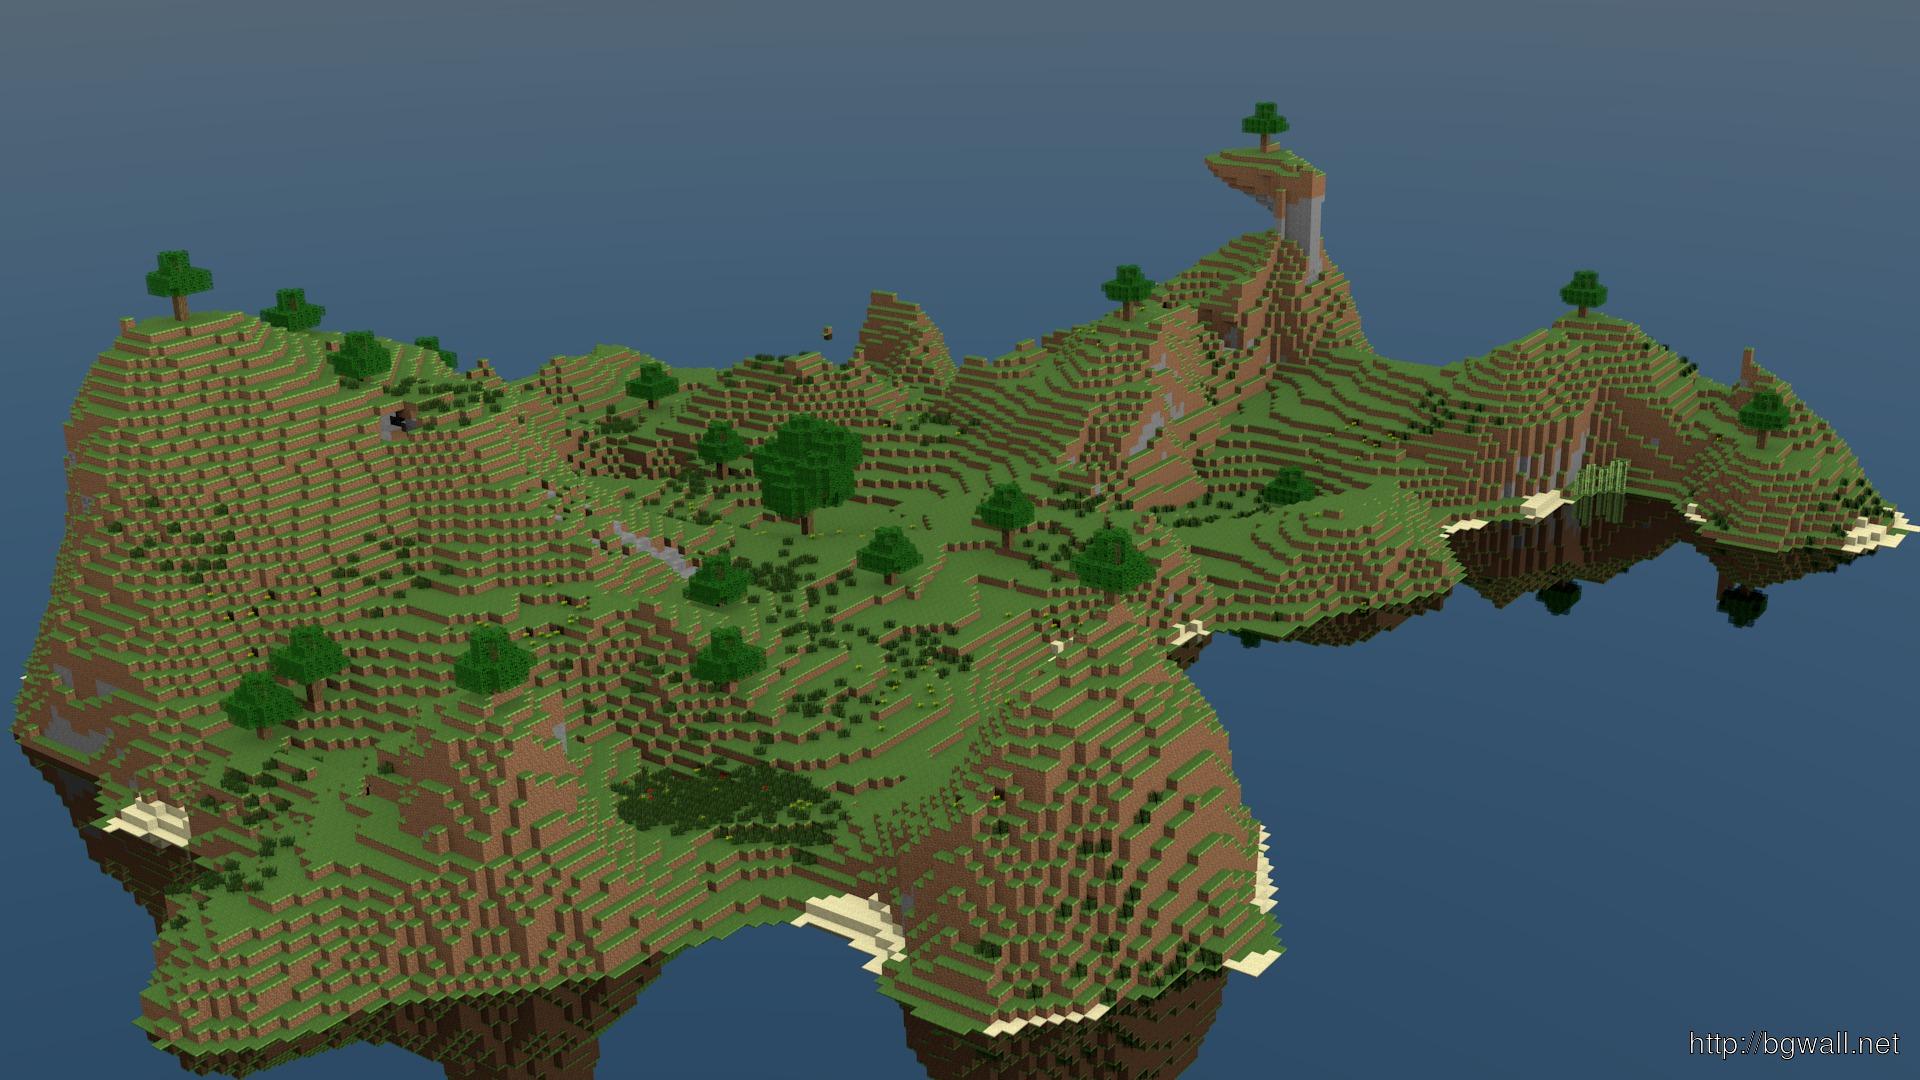 Minecraft Wallpaper Islands Full Size